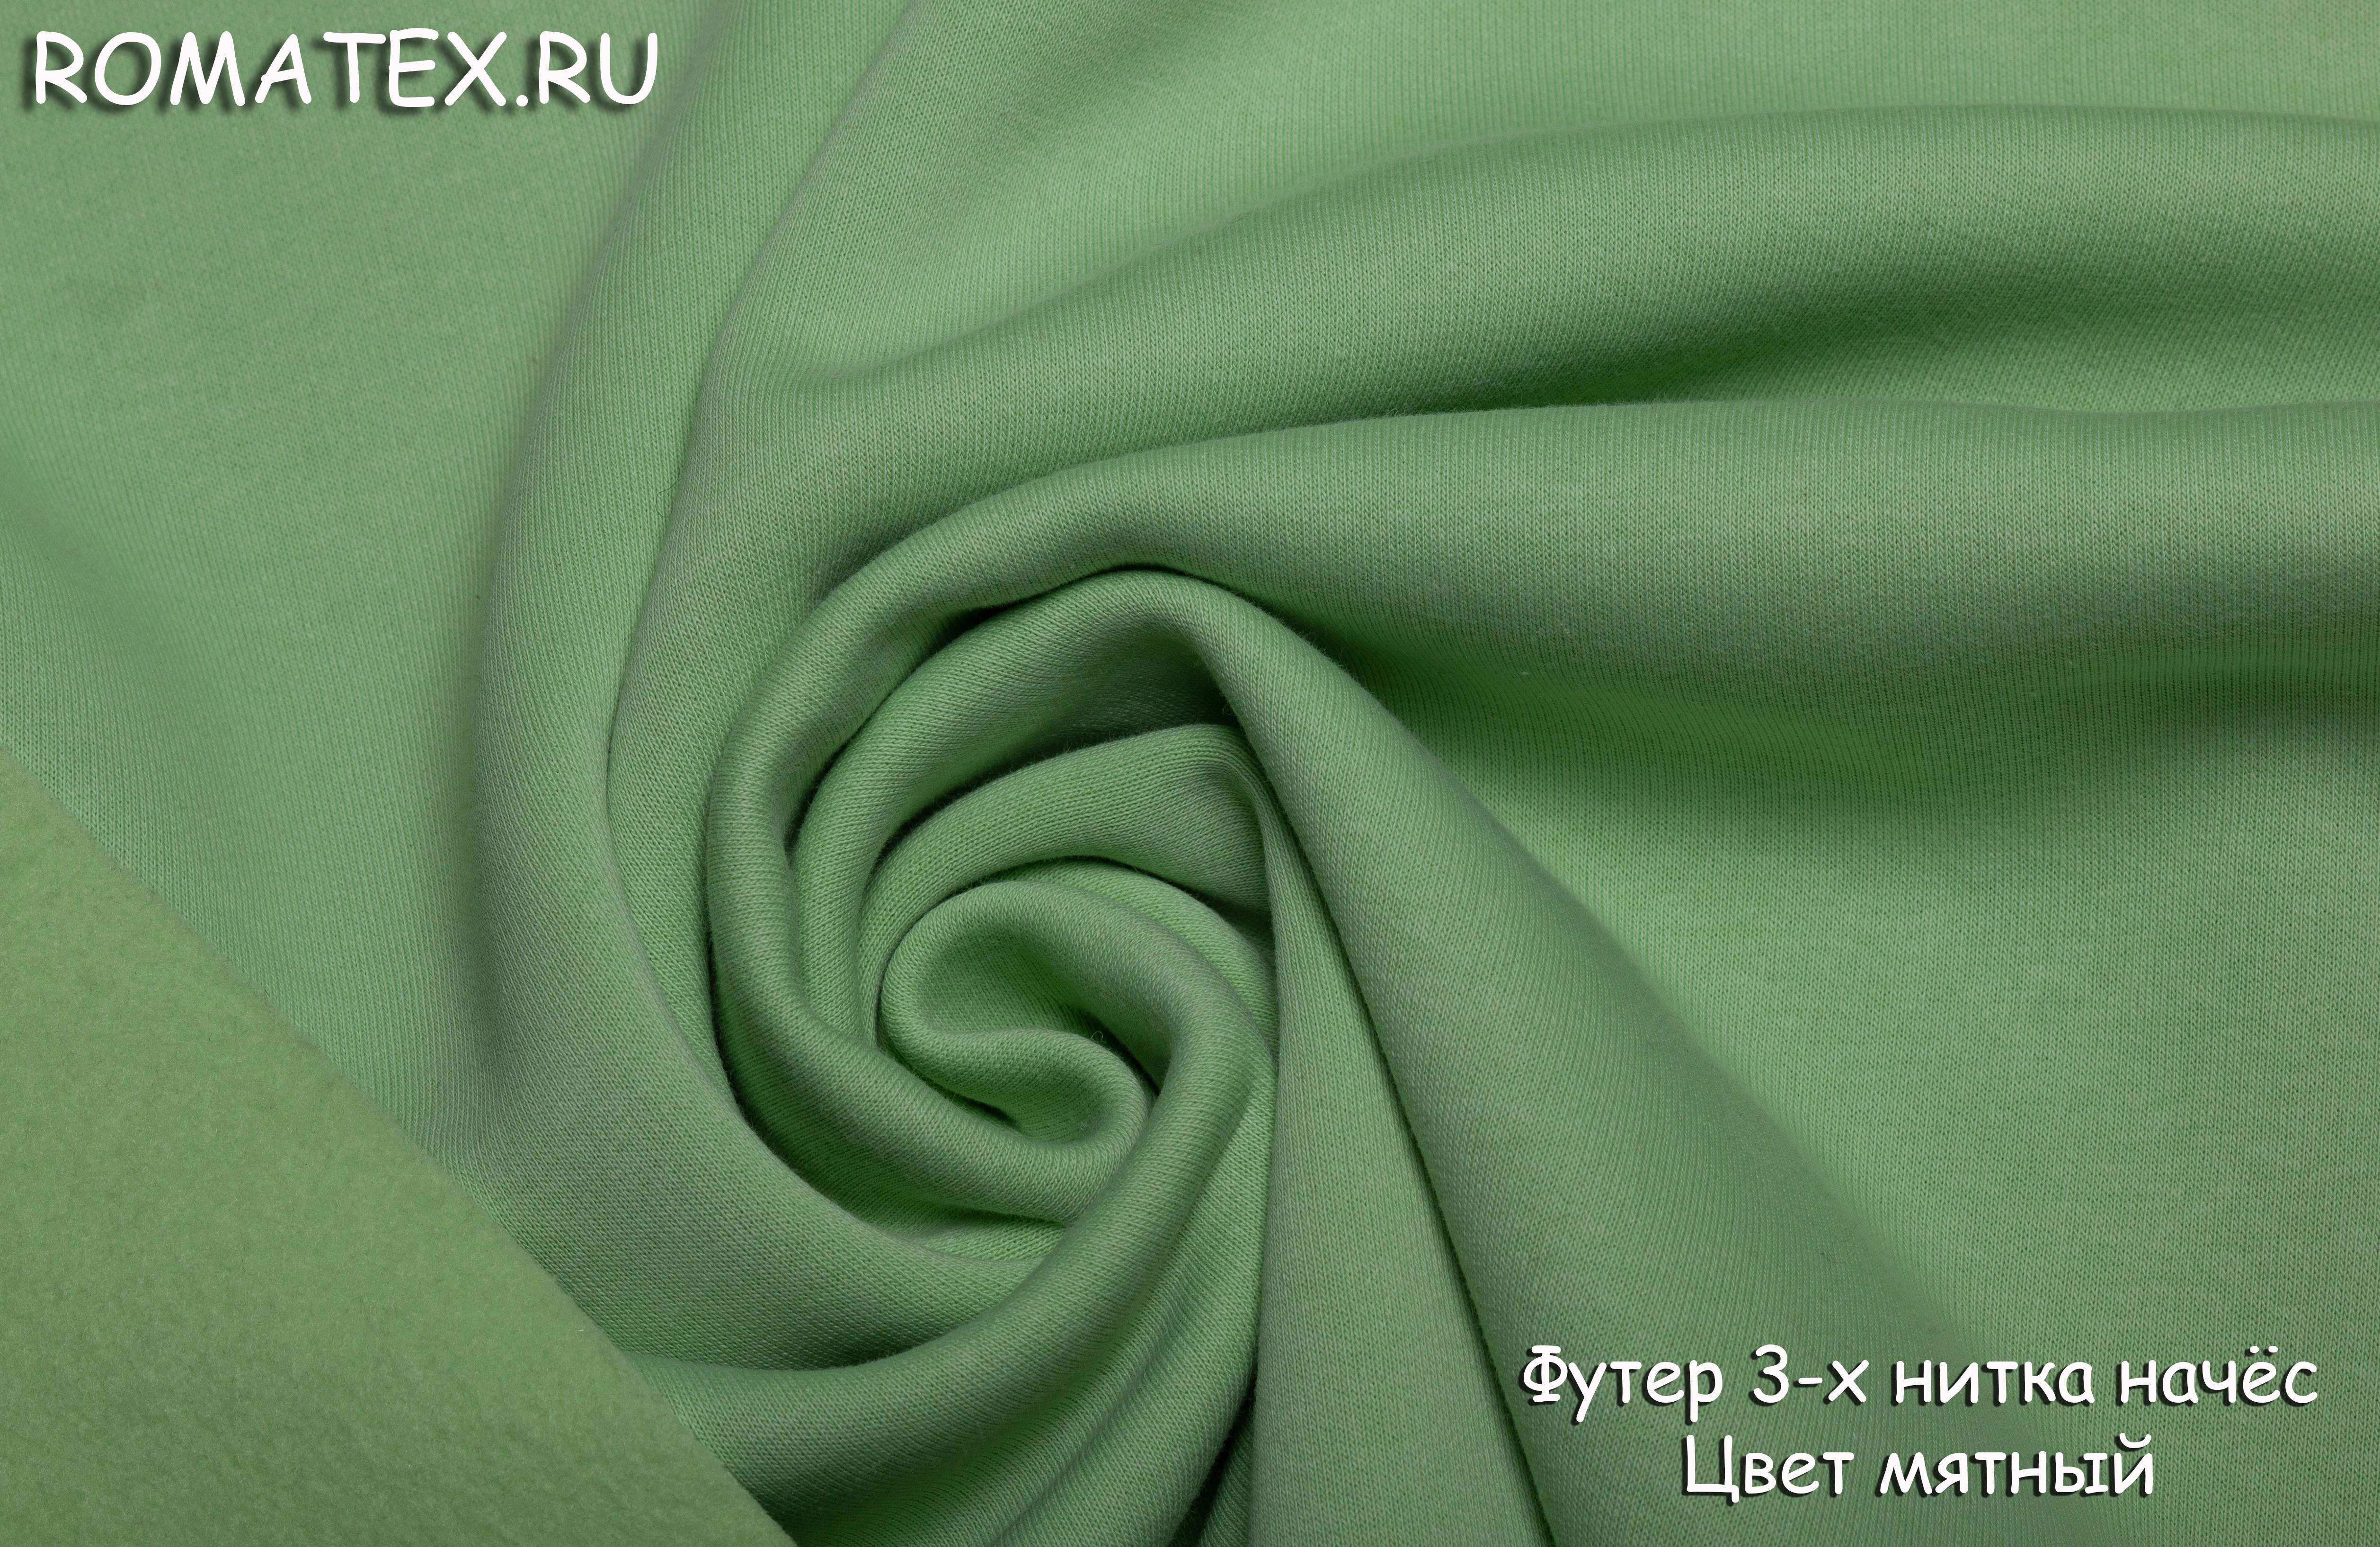 Футер 3-х нитка начес качество Пенье цвет мятный